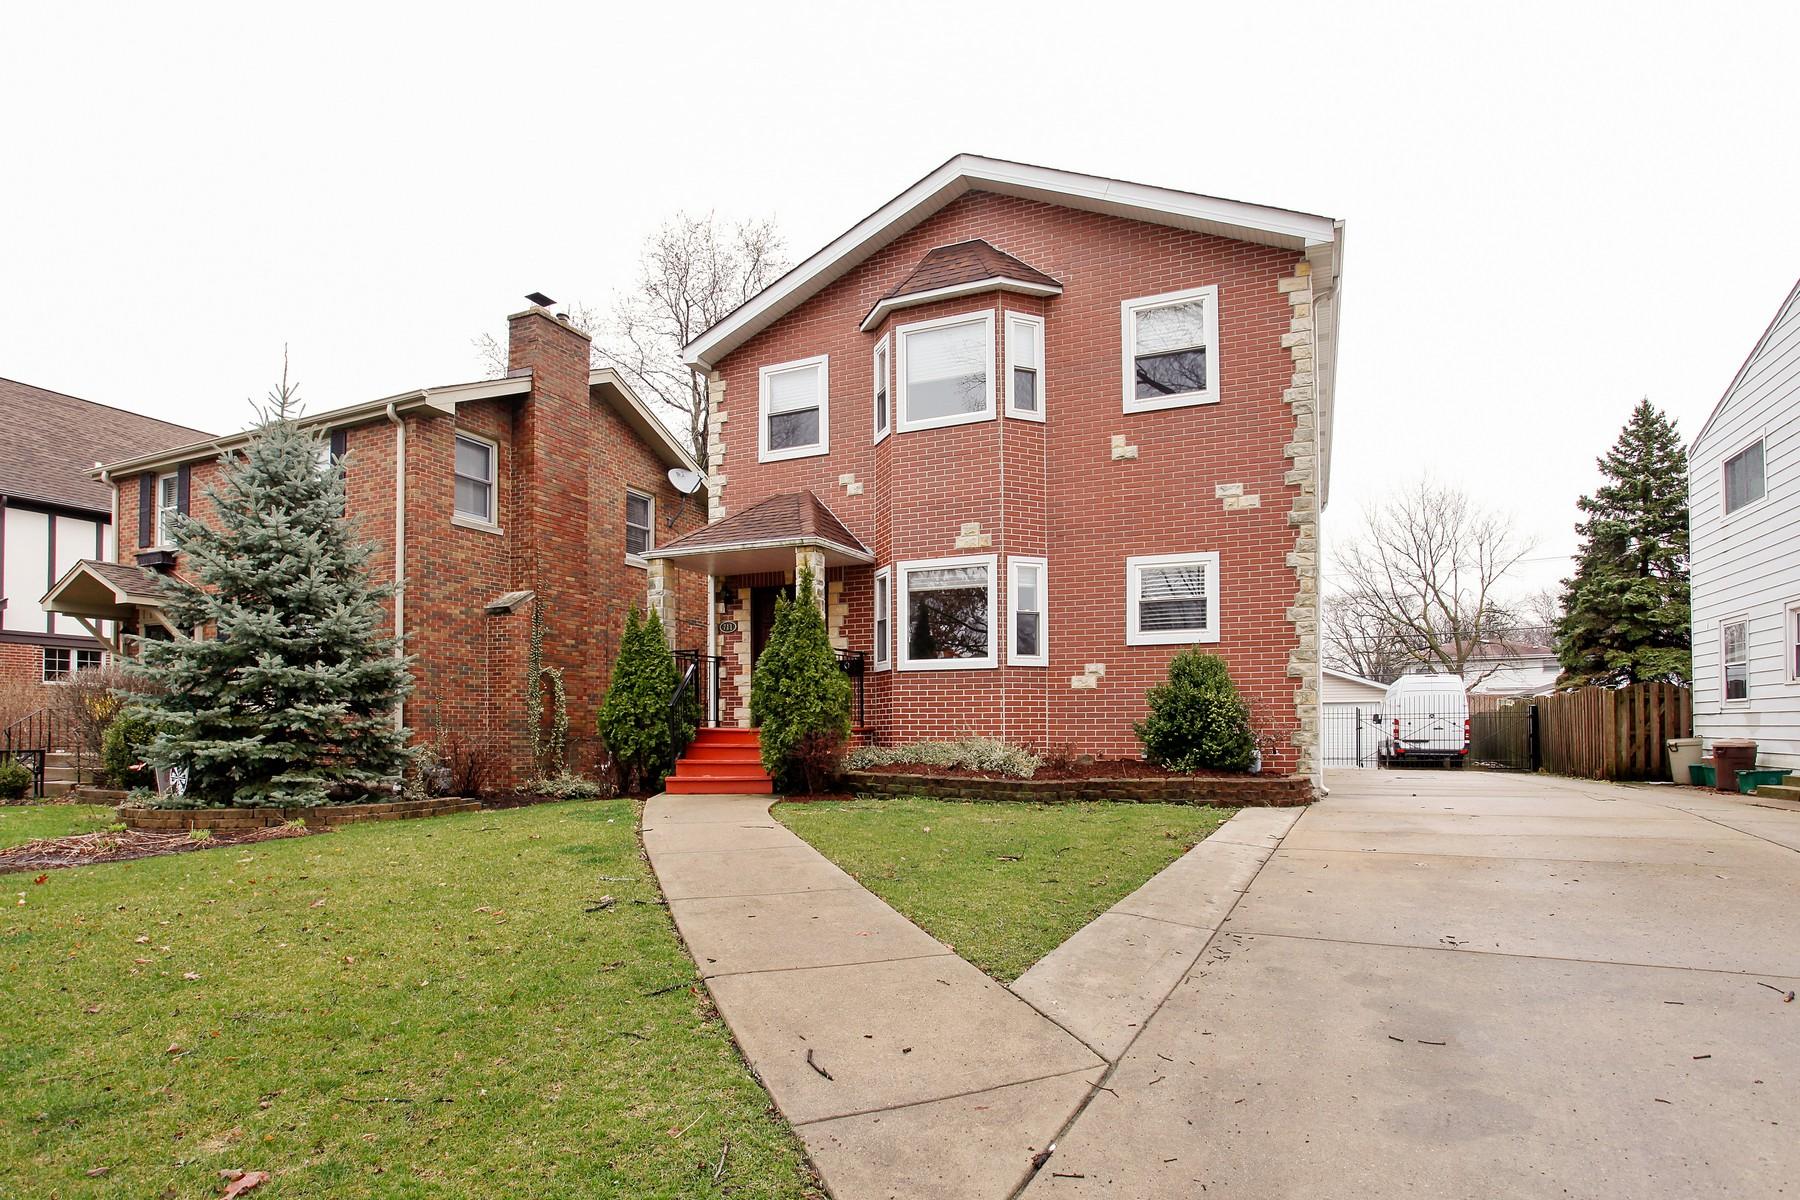 Casa para uma família para Venda às Beautiful Home in Desirable Location 711 S Madison Avenue La Grange, Illinois, 60525 Estados Unidos